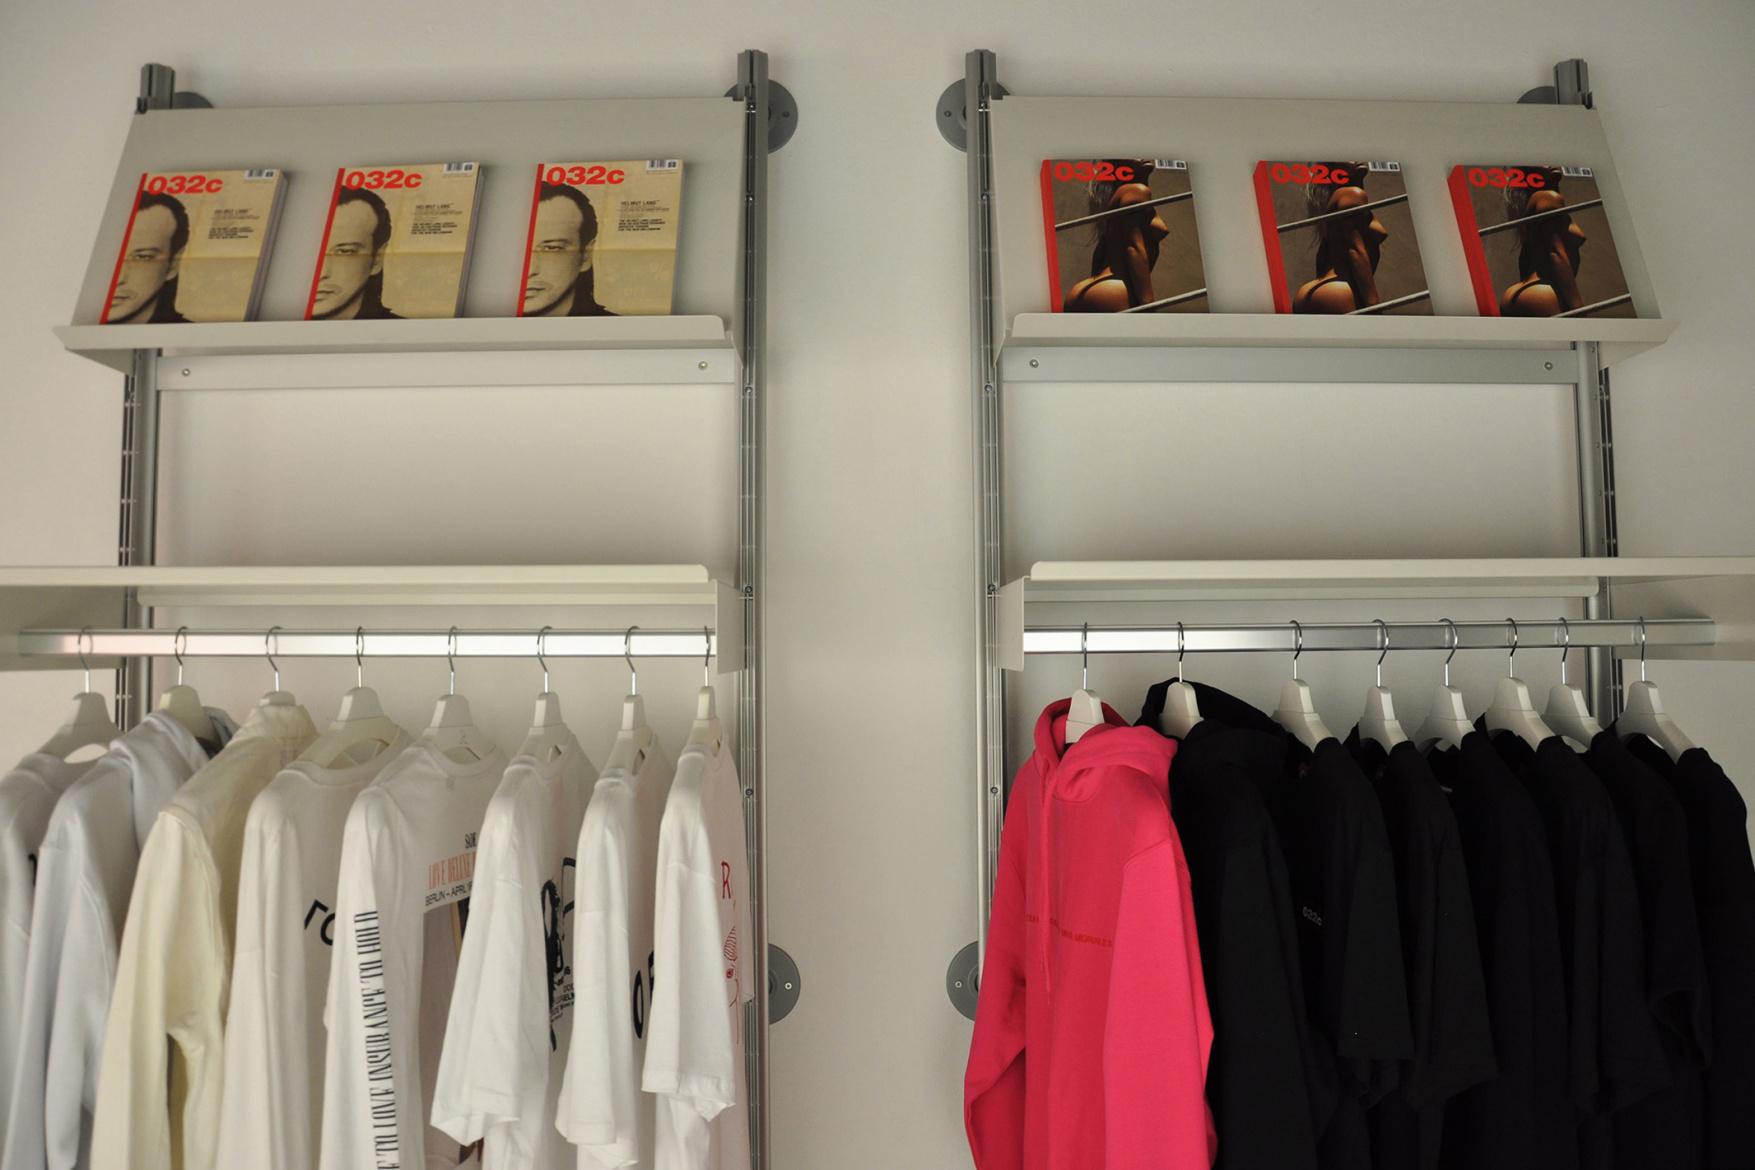 032c-store-opening-berlin-2